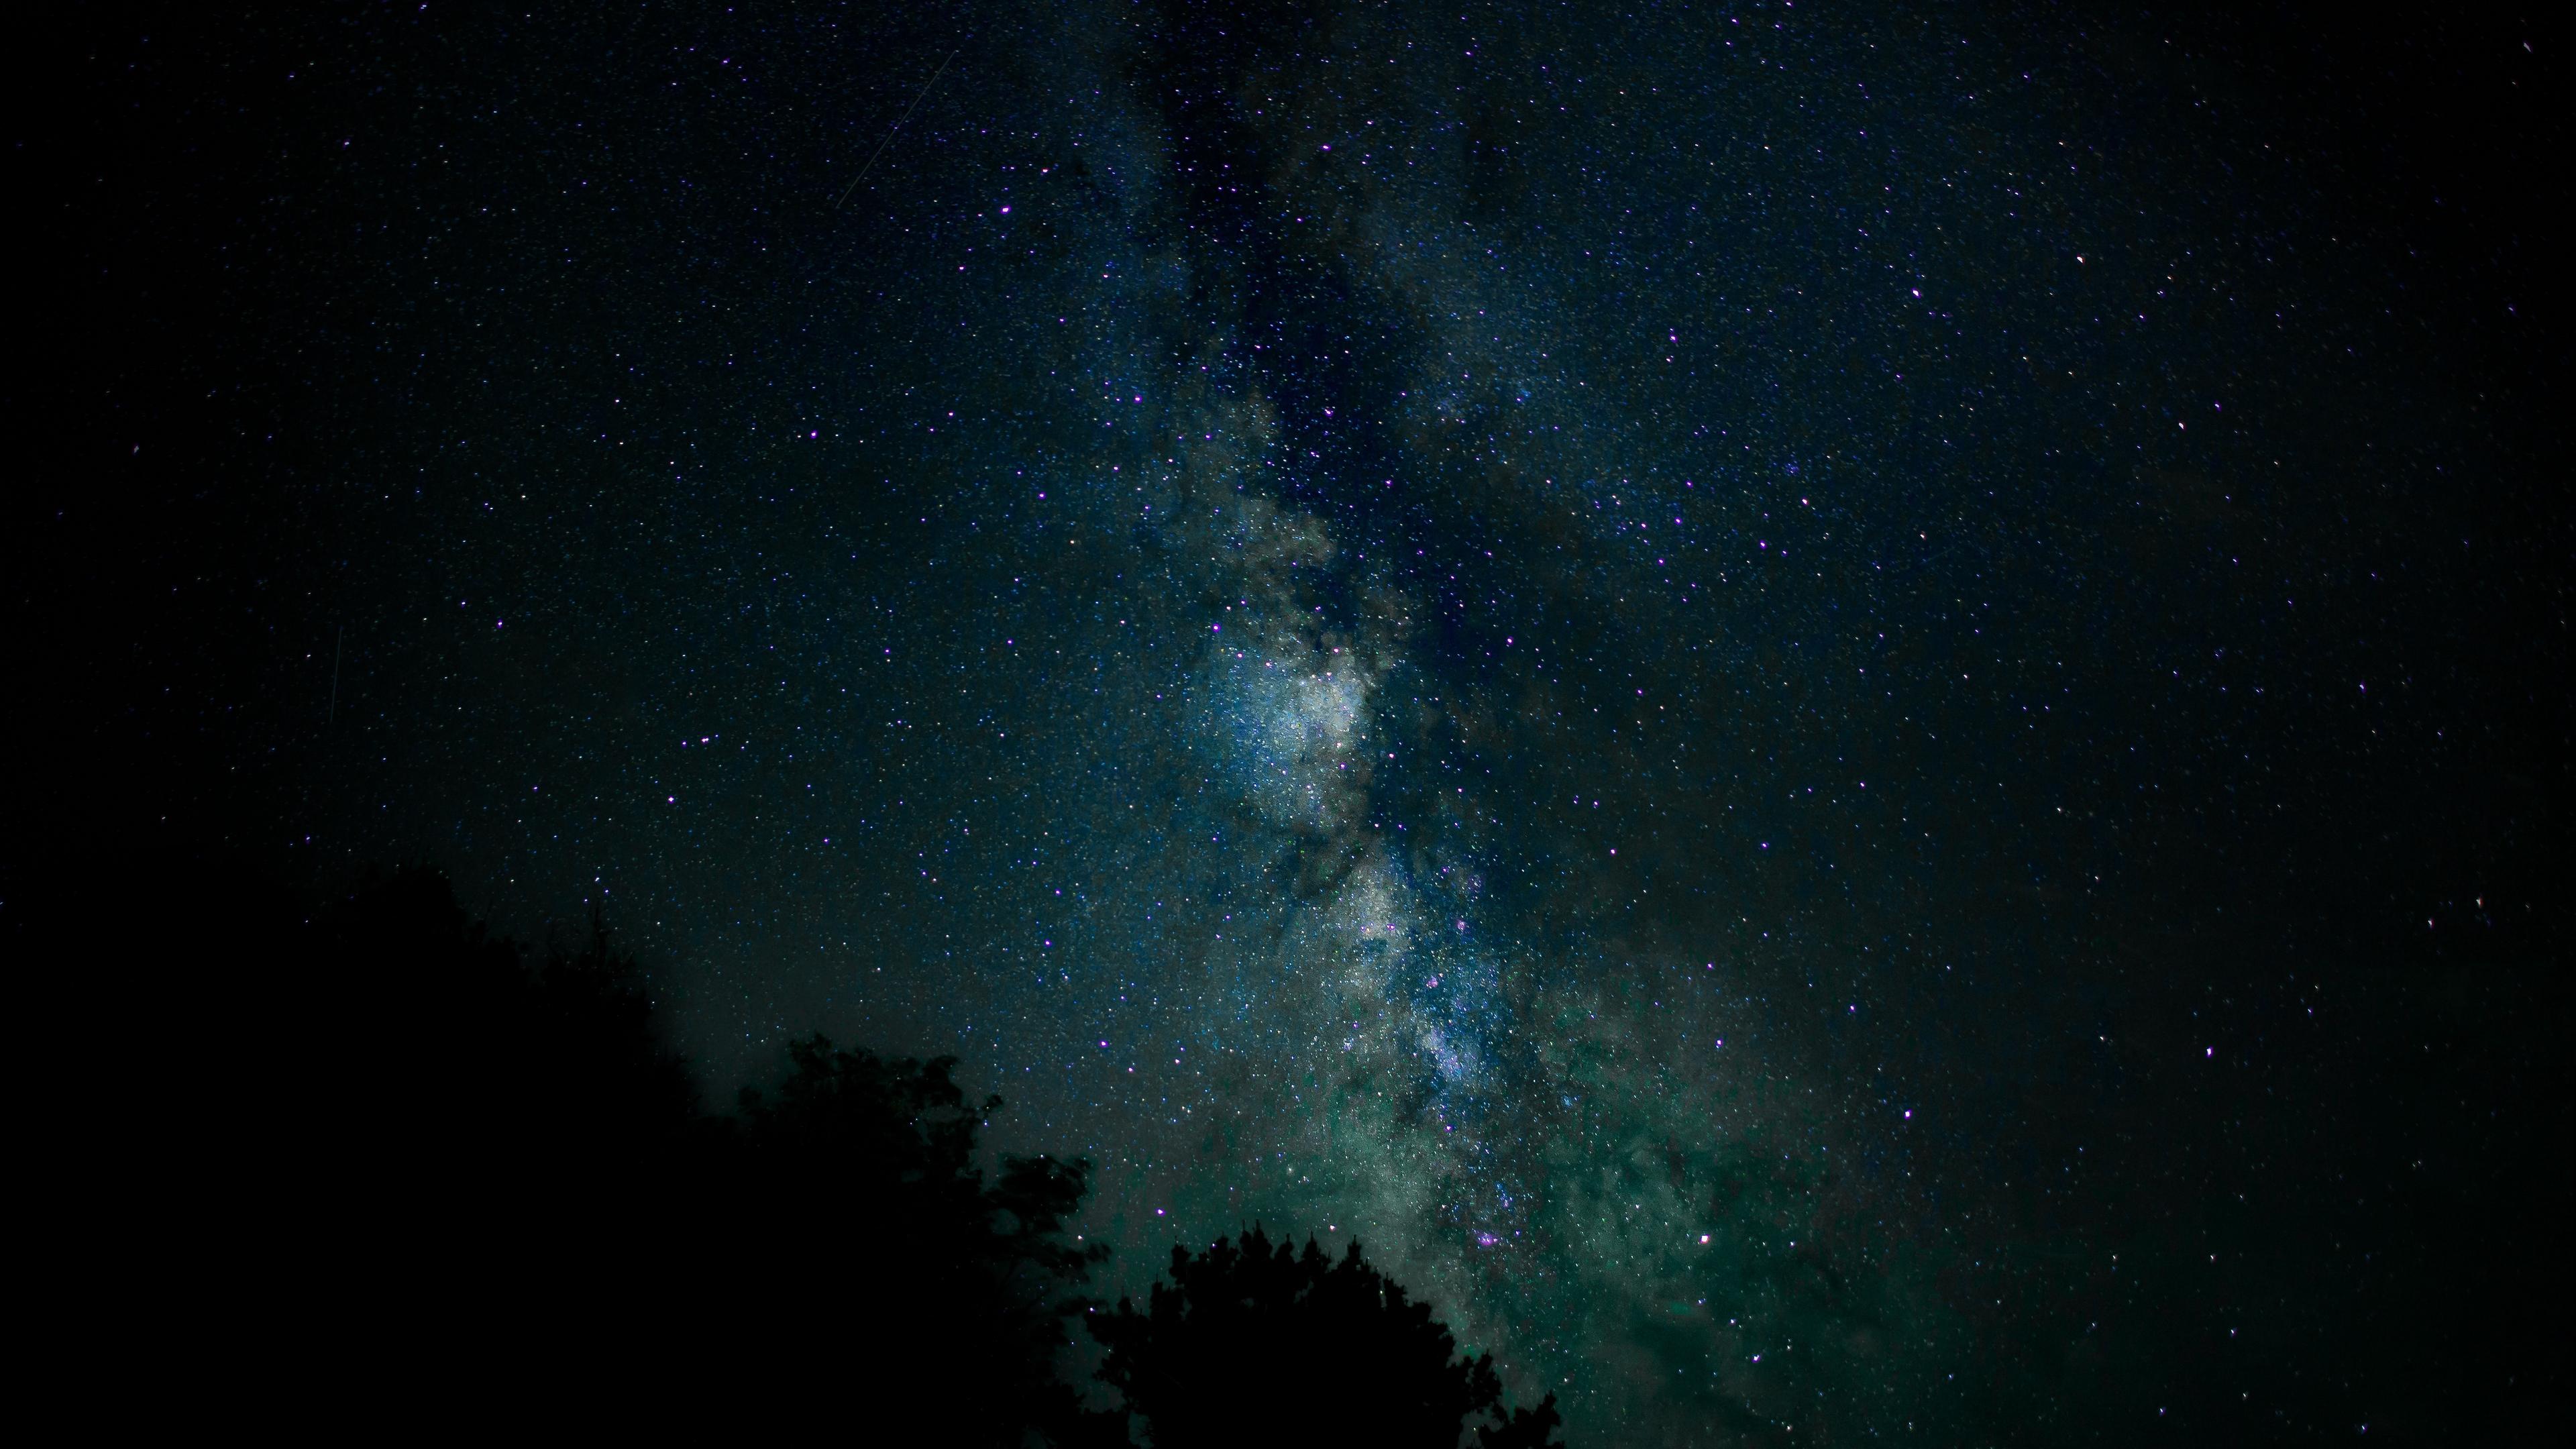 starry sky stars milky way night 4k 1536016940 - starry sky, stars, milky way, night 4k - Stars, starry sky, milky way